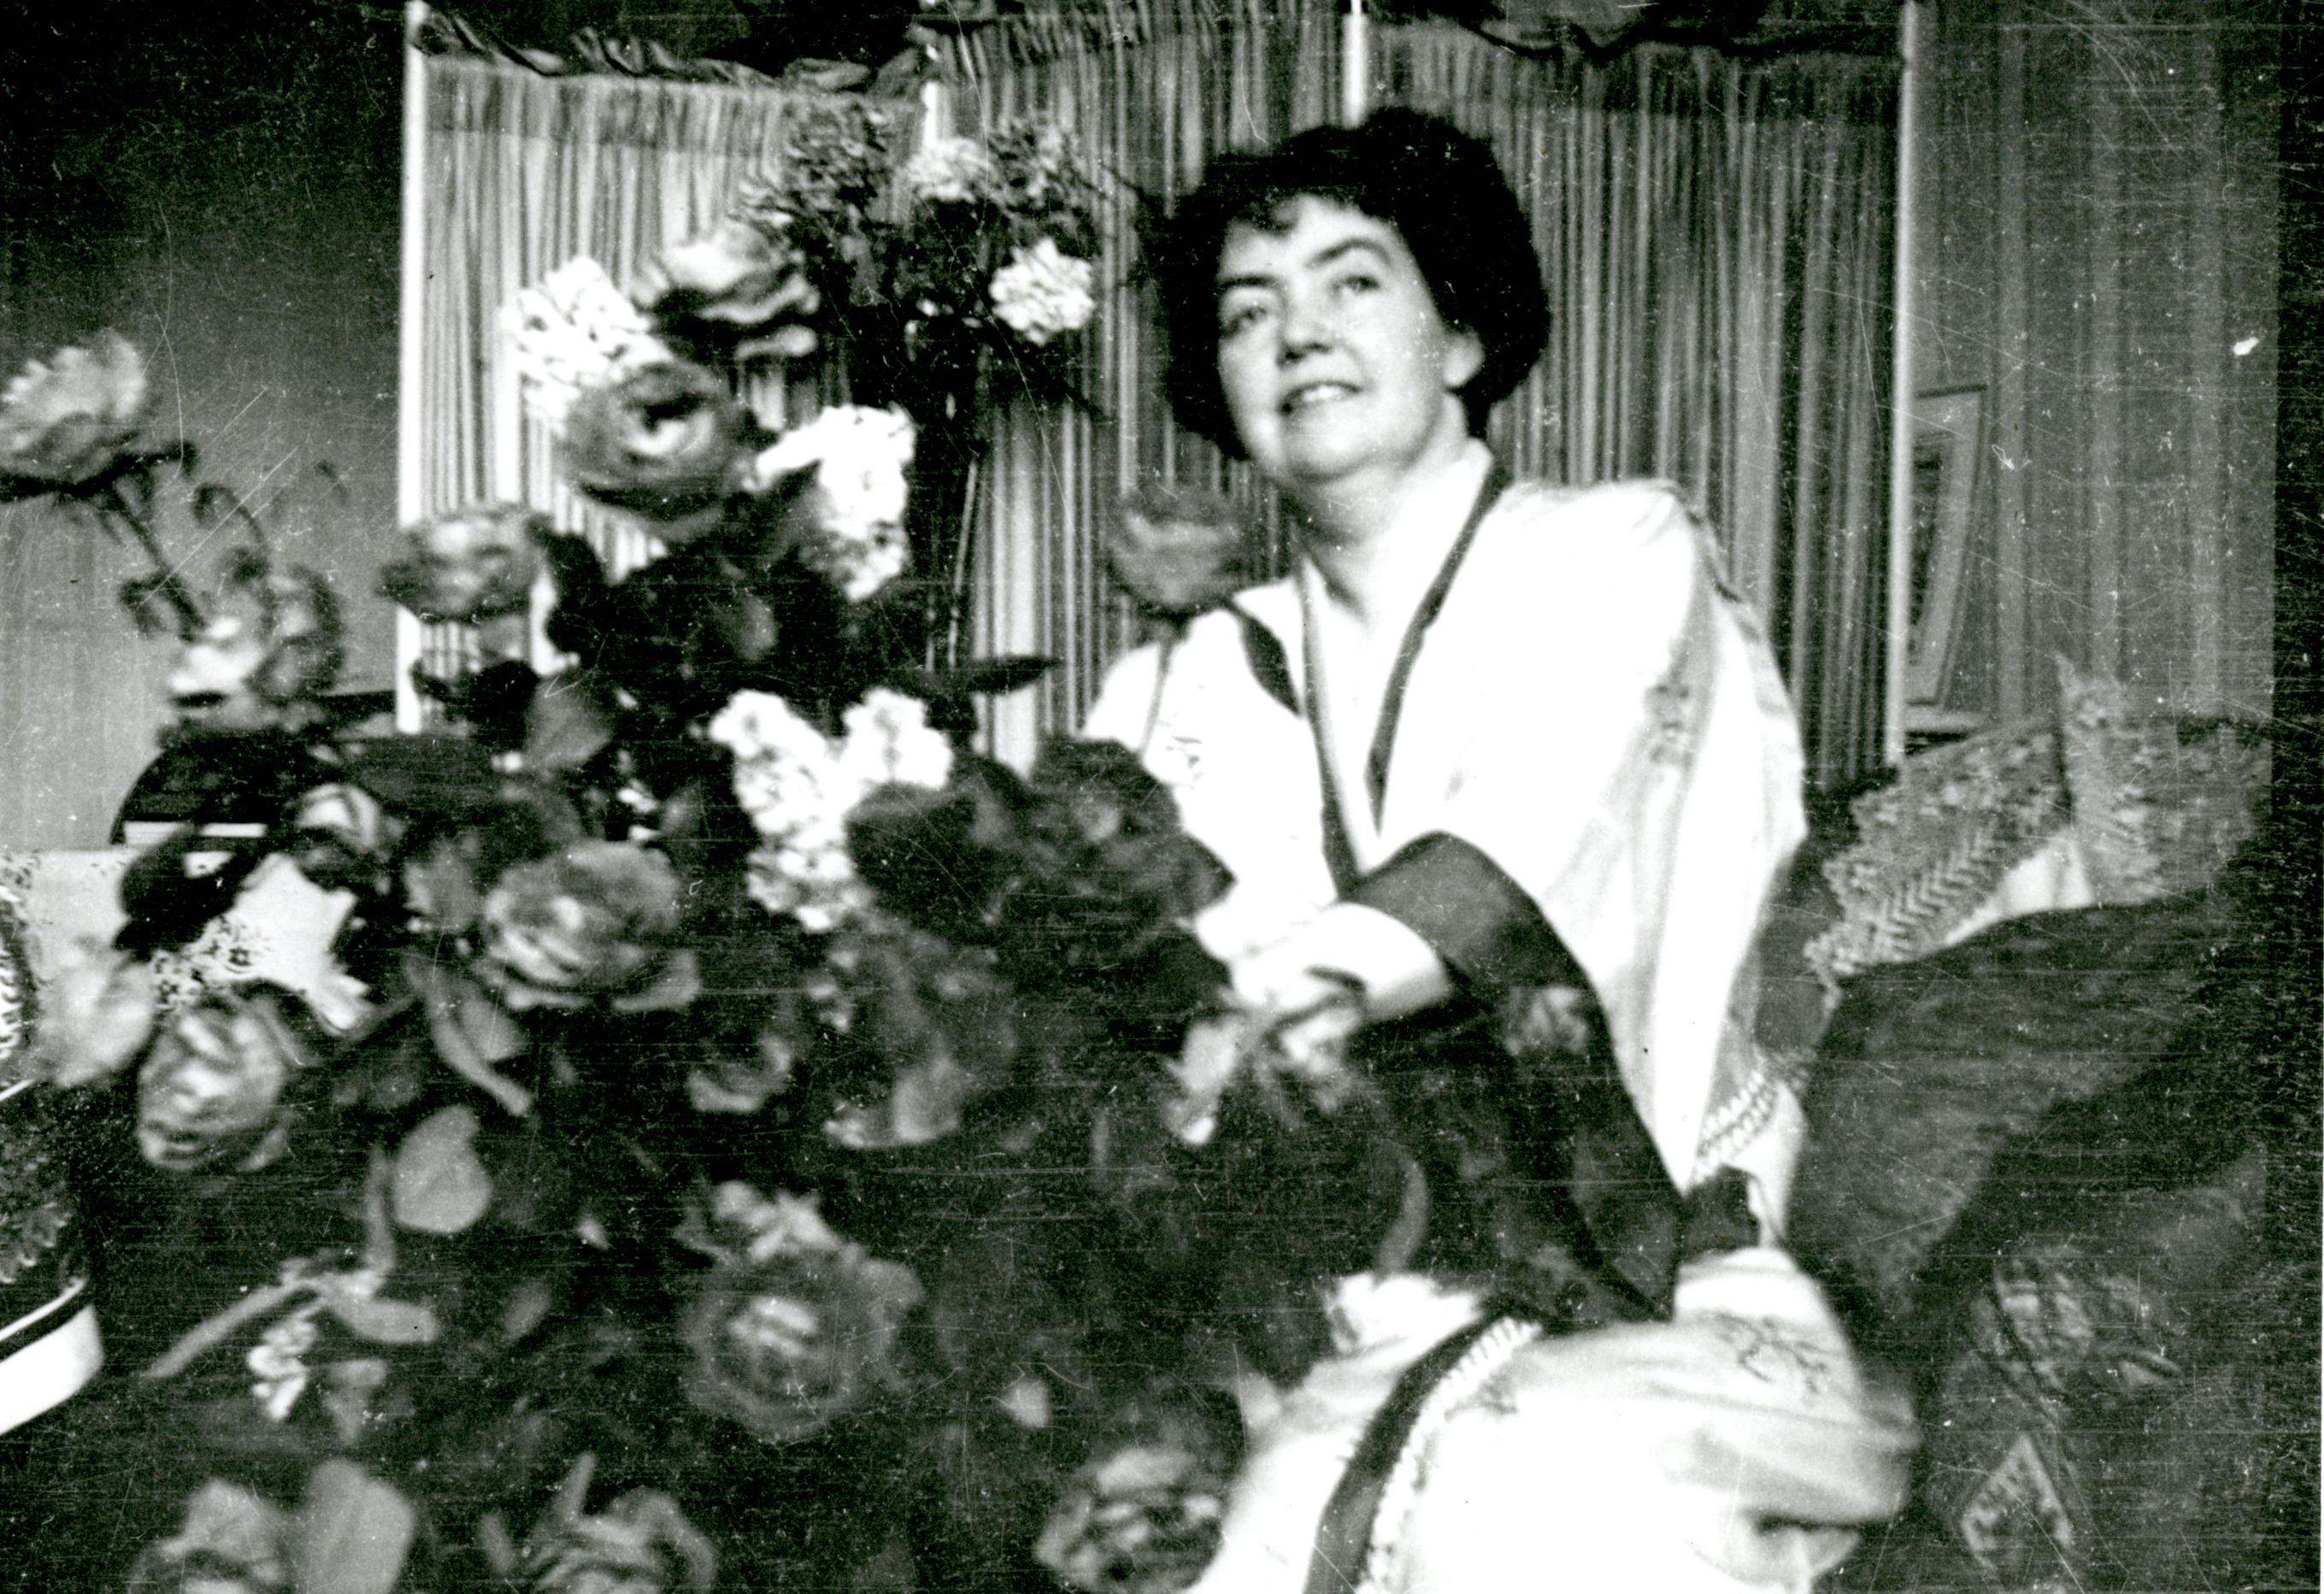 Catherine Hershey loved roses.